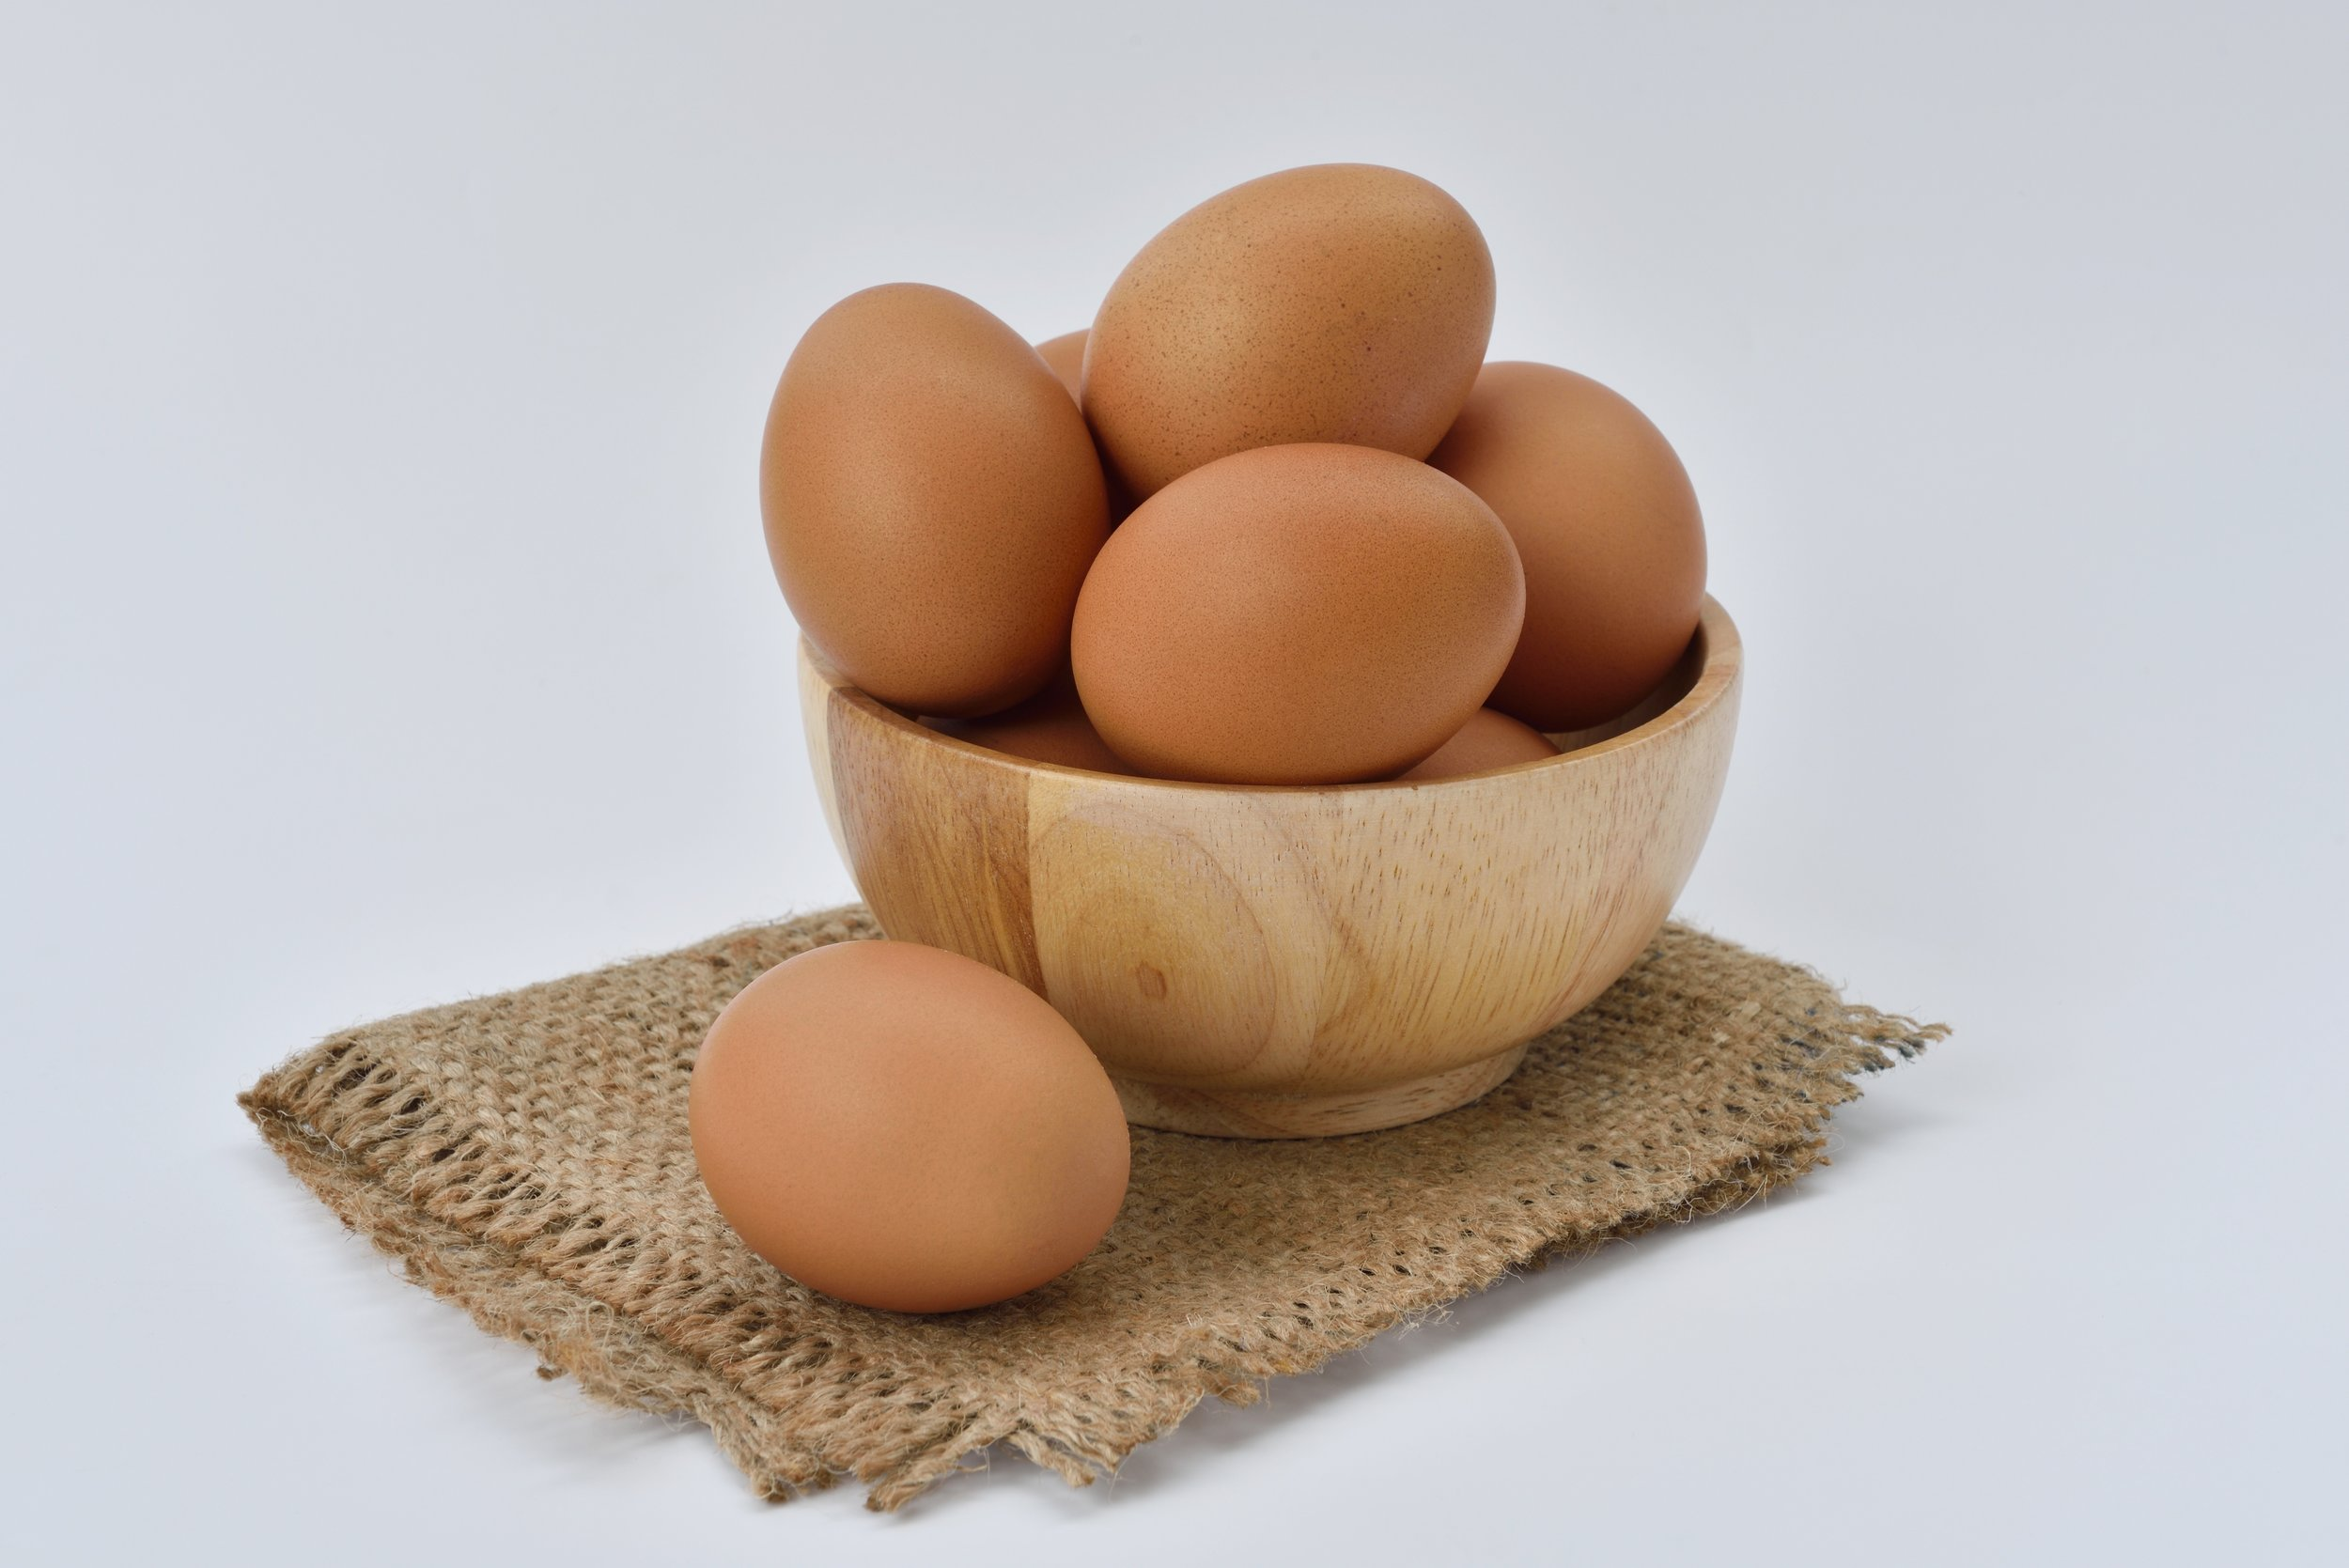 egg-white-food-protein-162712.jpeg